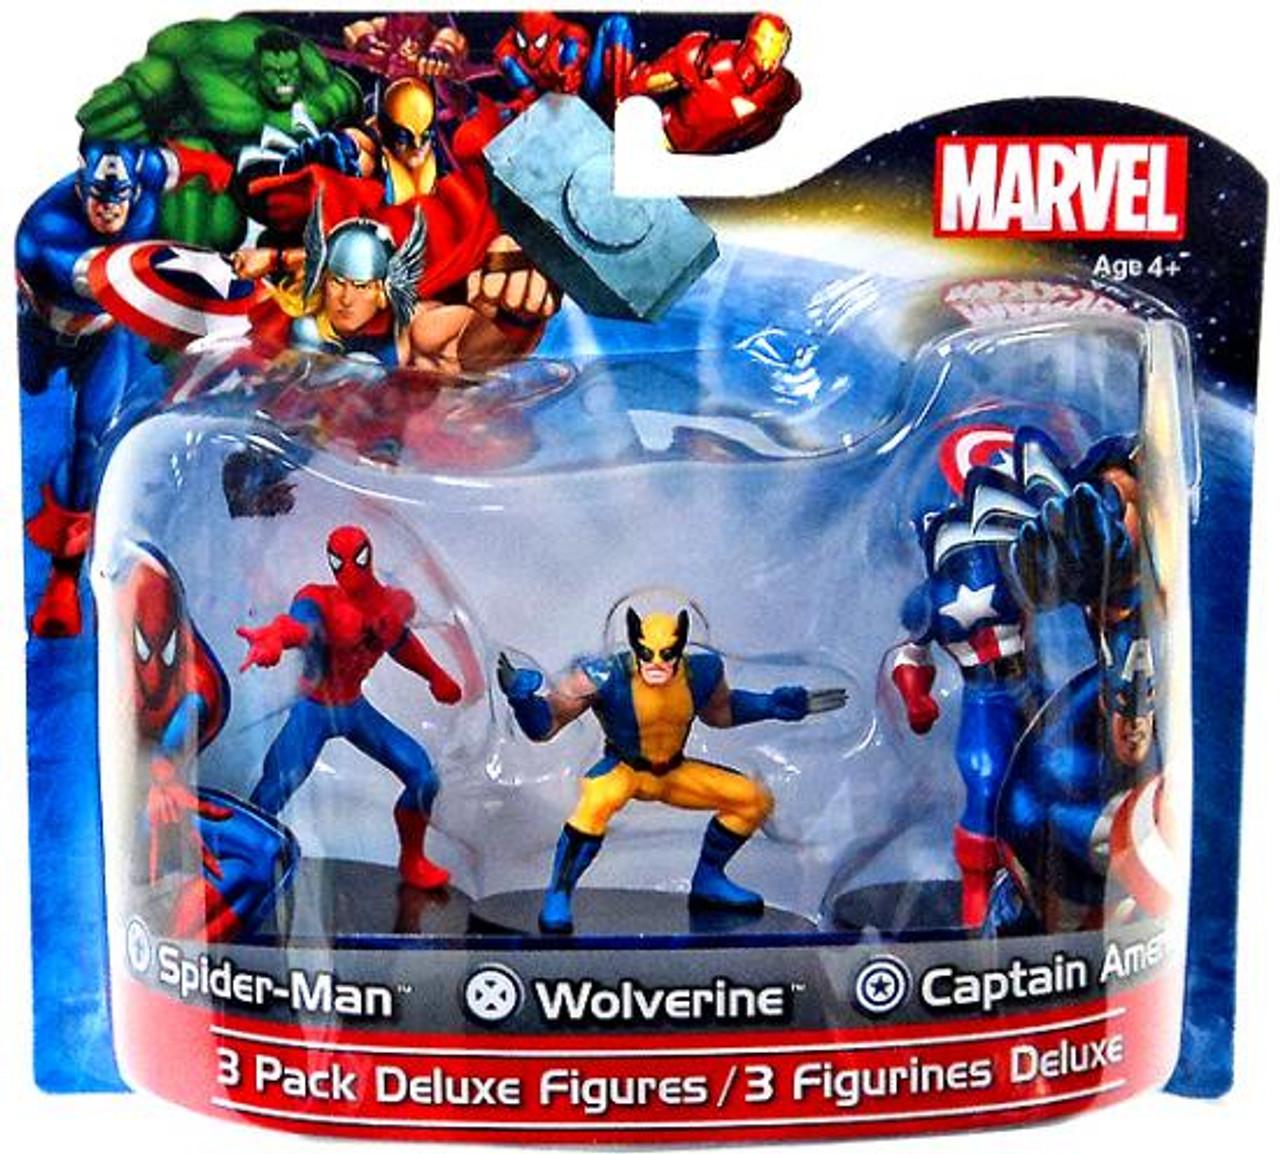 Marvel 4 Inch Deluxe Figures Spider-Man, Wolverine & Captain America PVC Figure 3-Pack